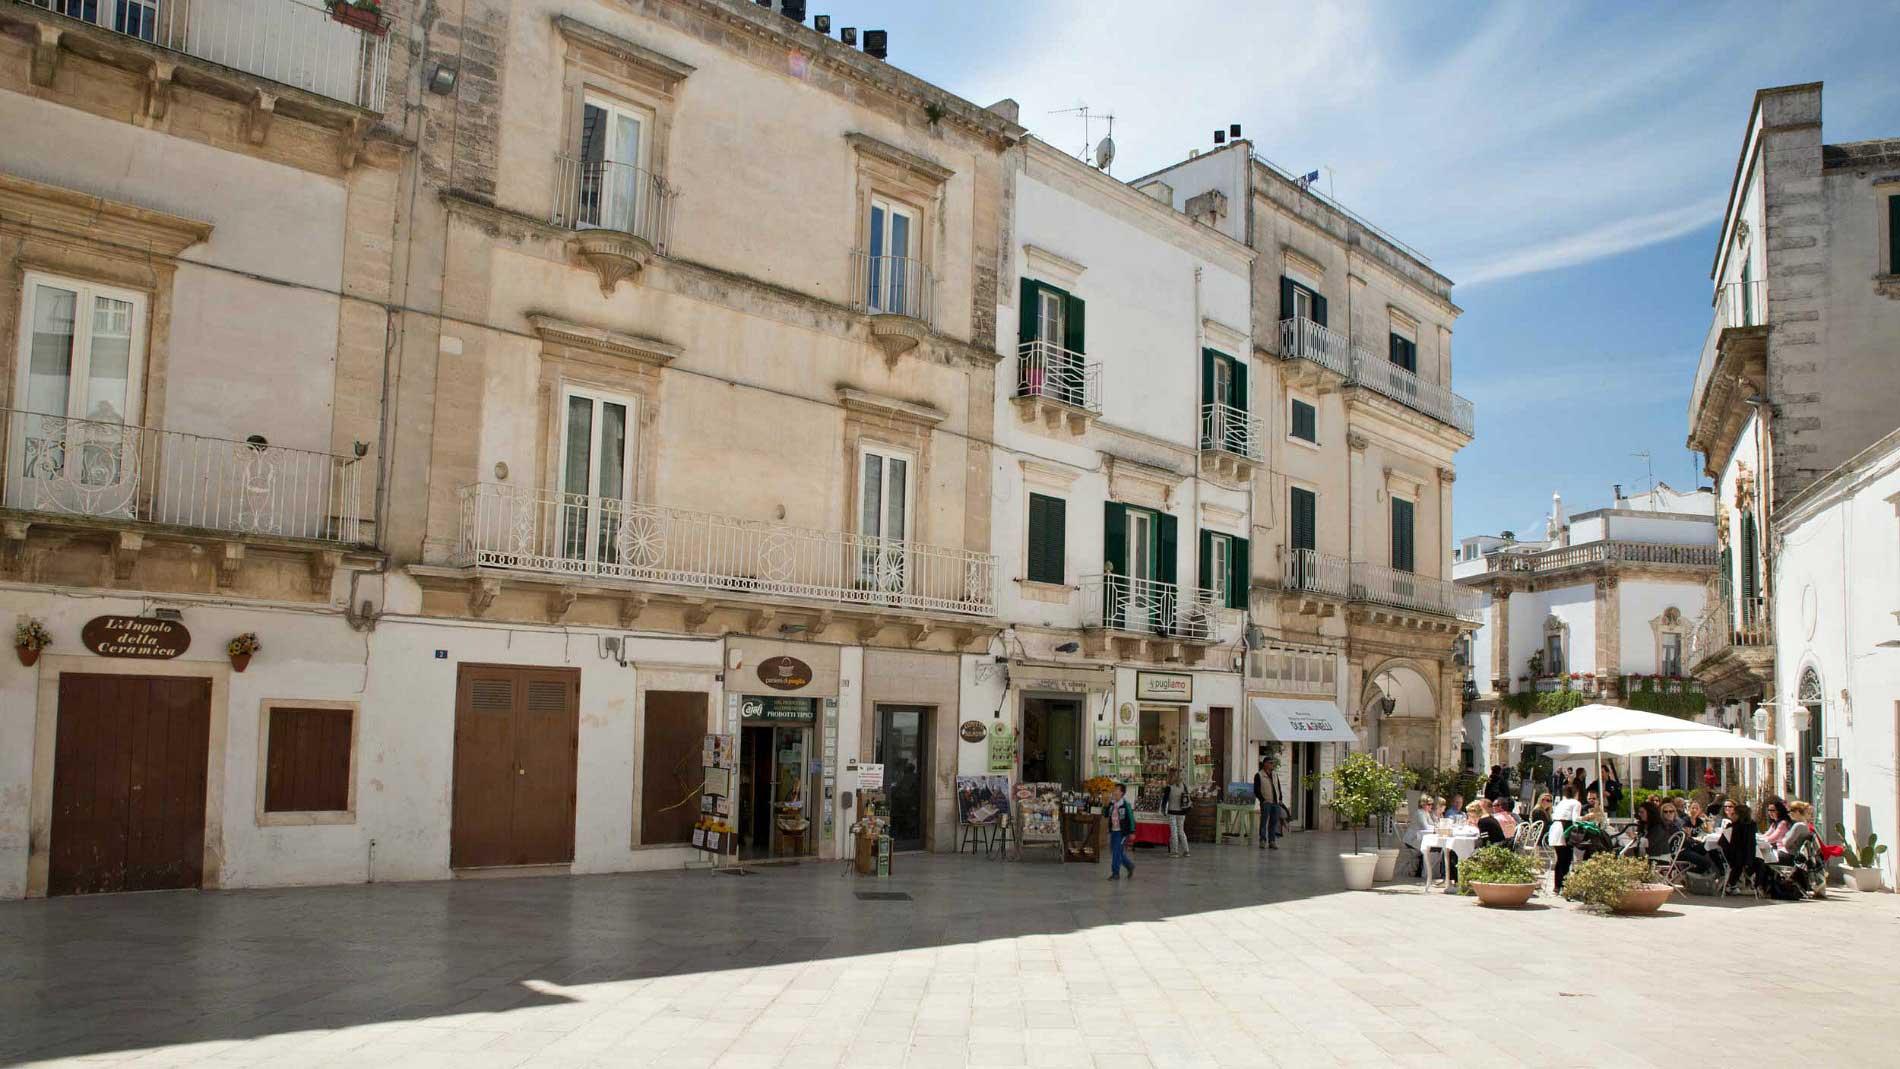 The charming Martina Franca, not far from Bari. Photo by Francois